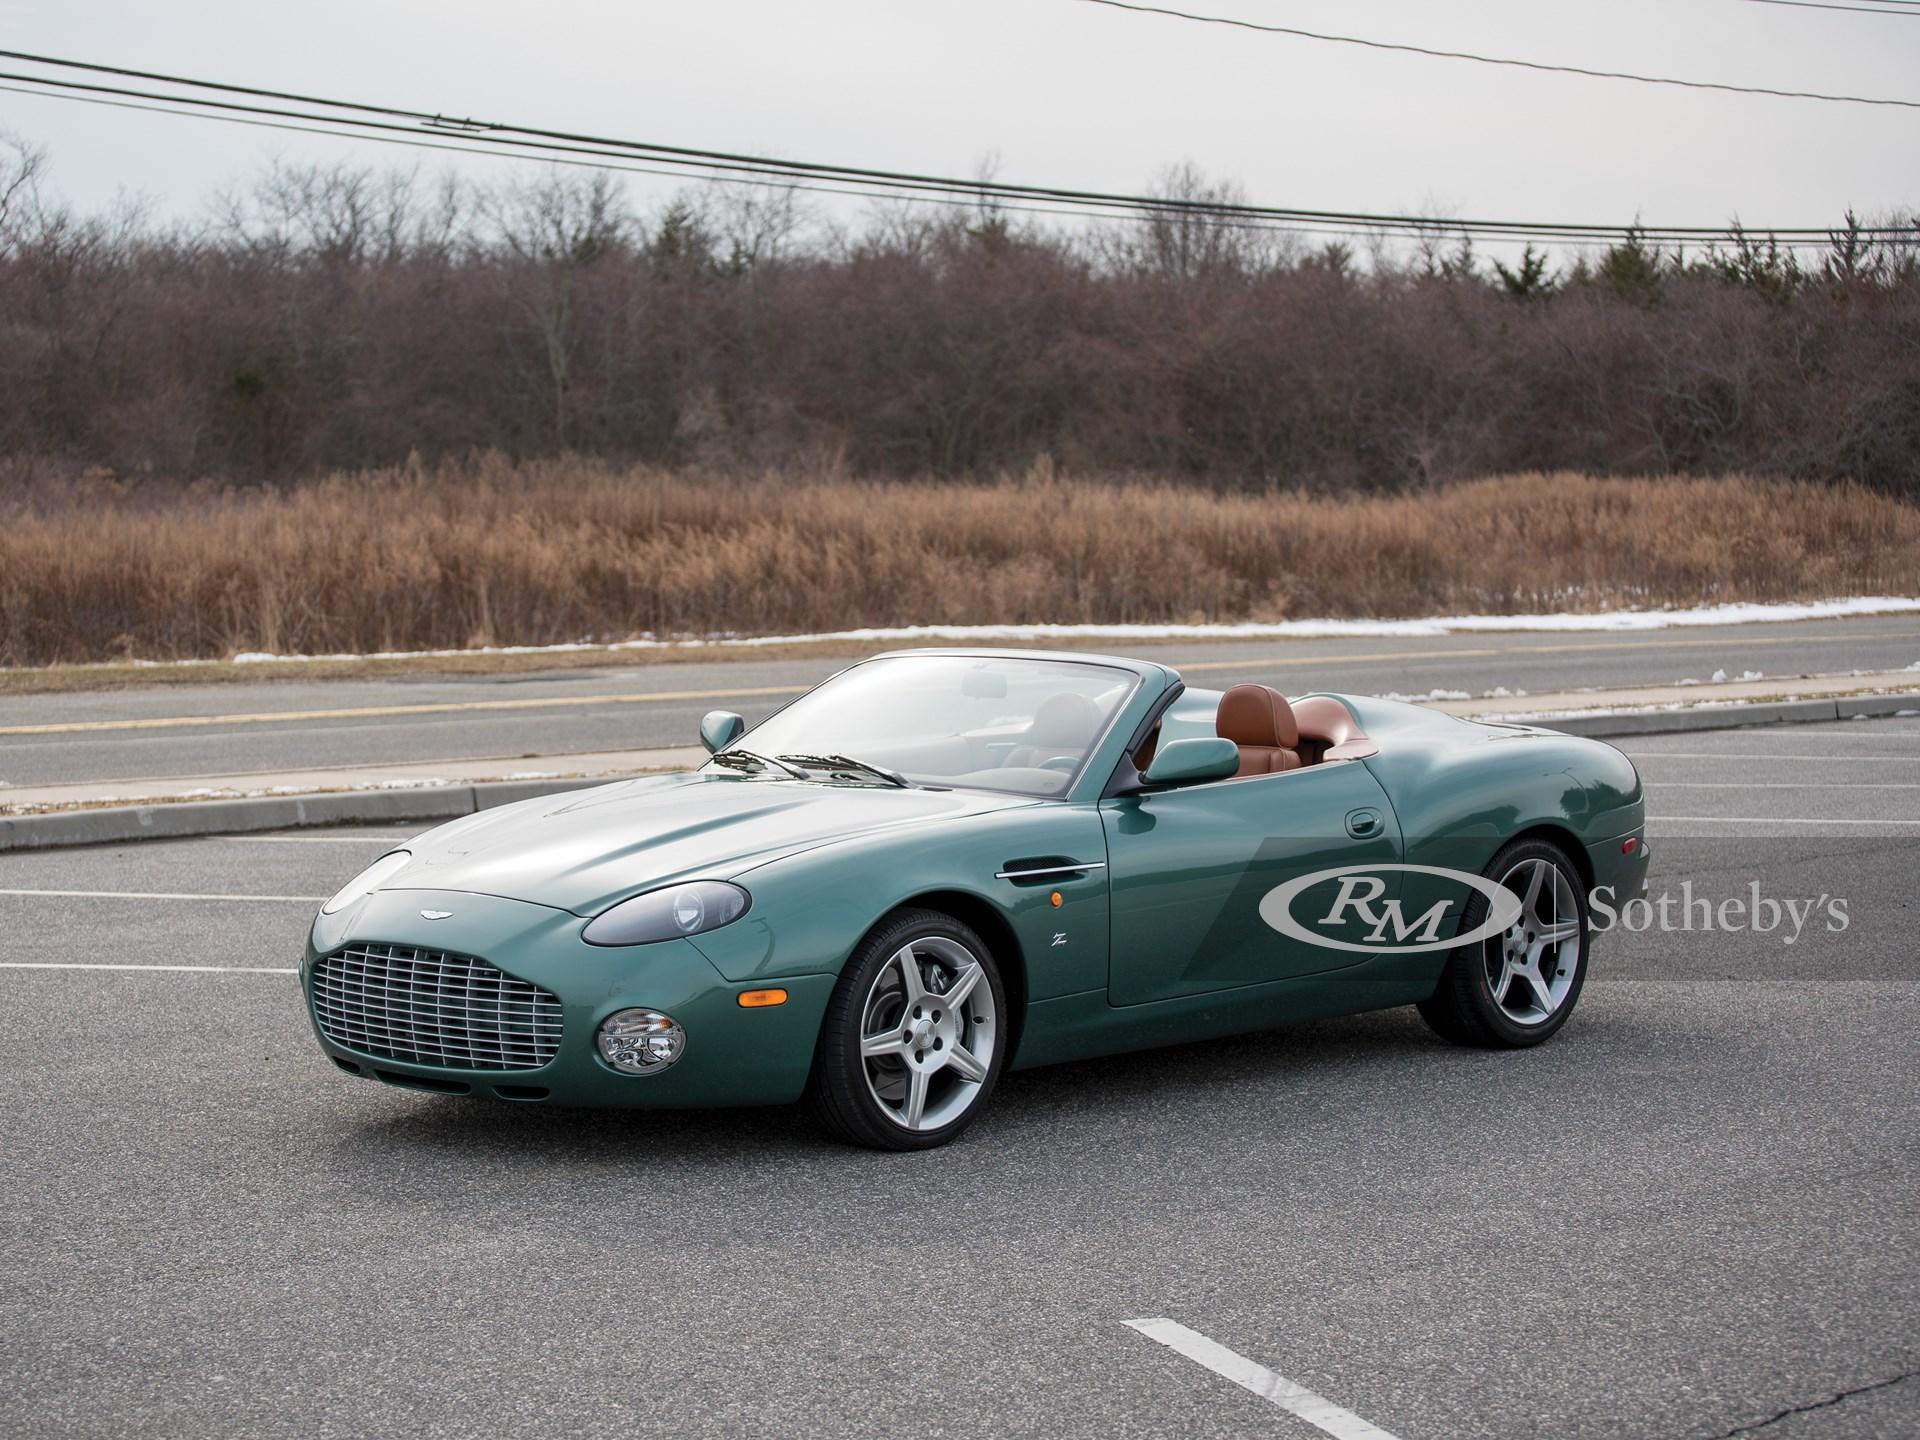 2003 Aston Martin Db Ar1 Zagato Amelia Island 2018 Rm Sotheby S